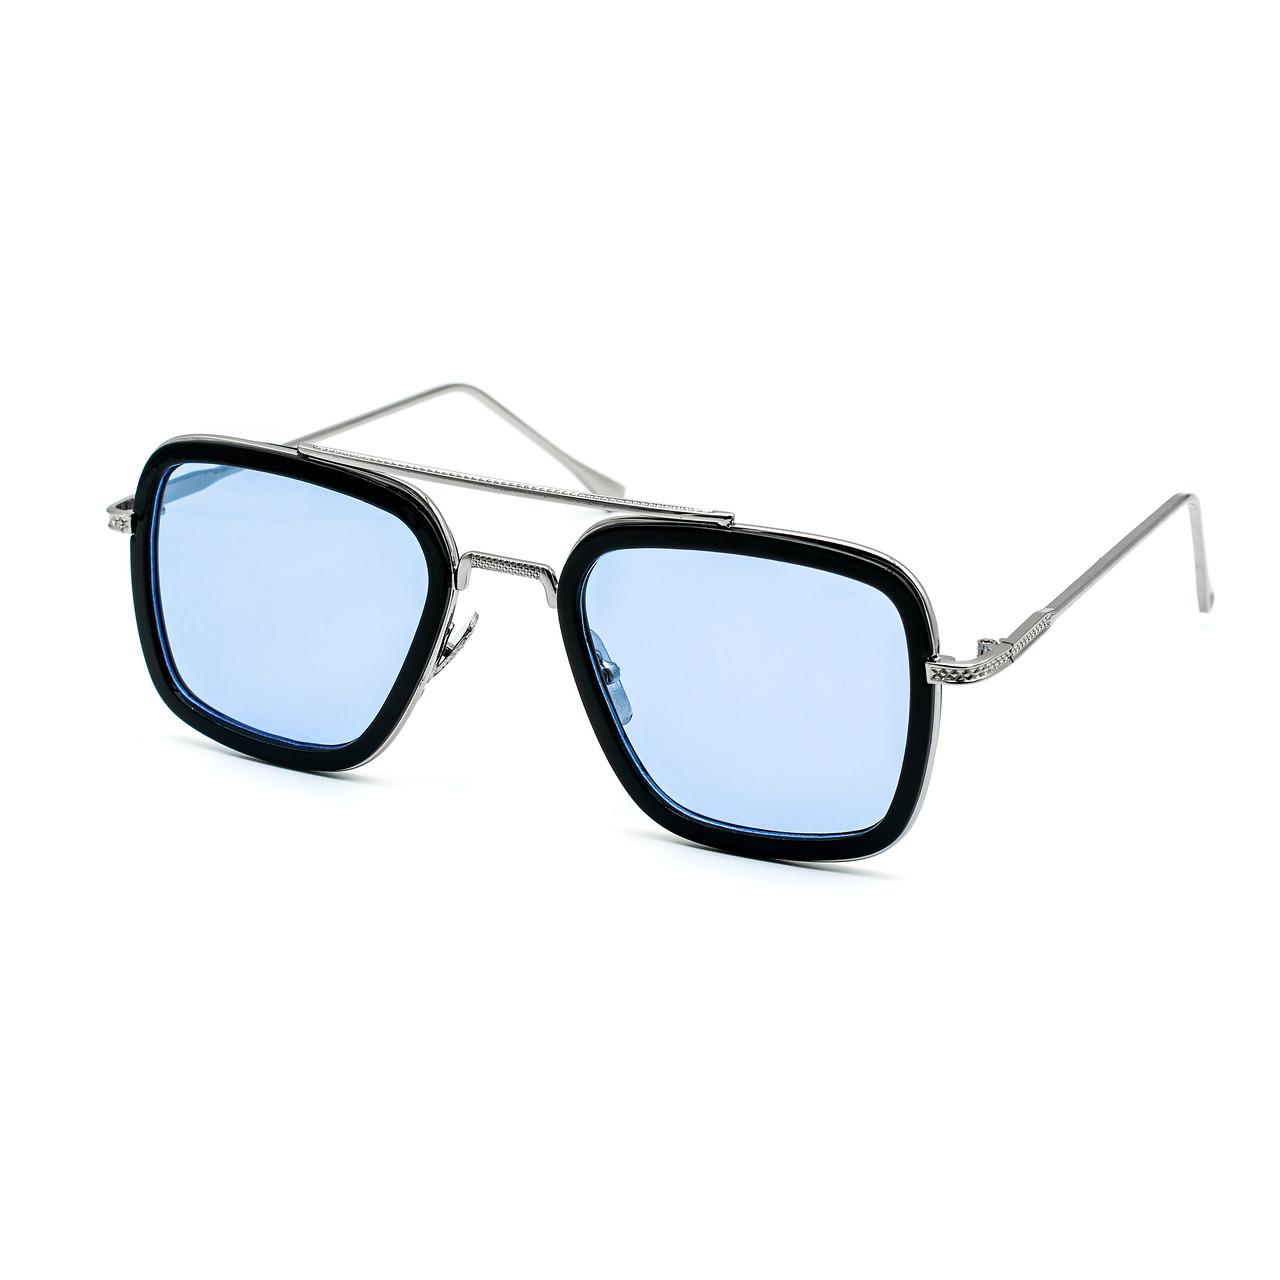 Солнцезащитные очки Dubery - Tony Stark series (Light blue)